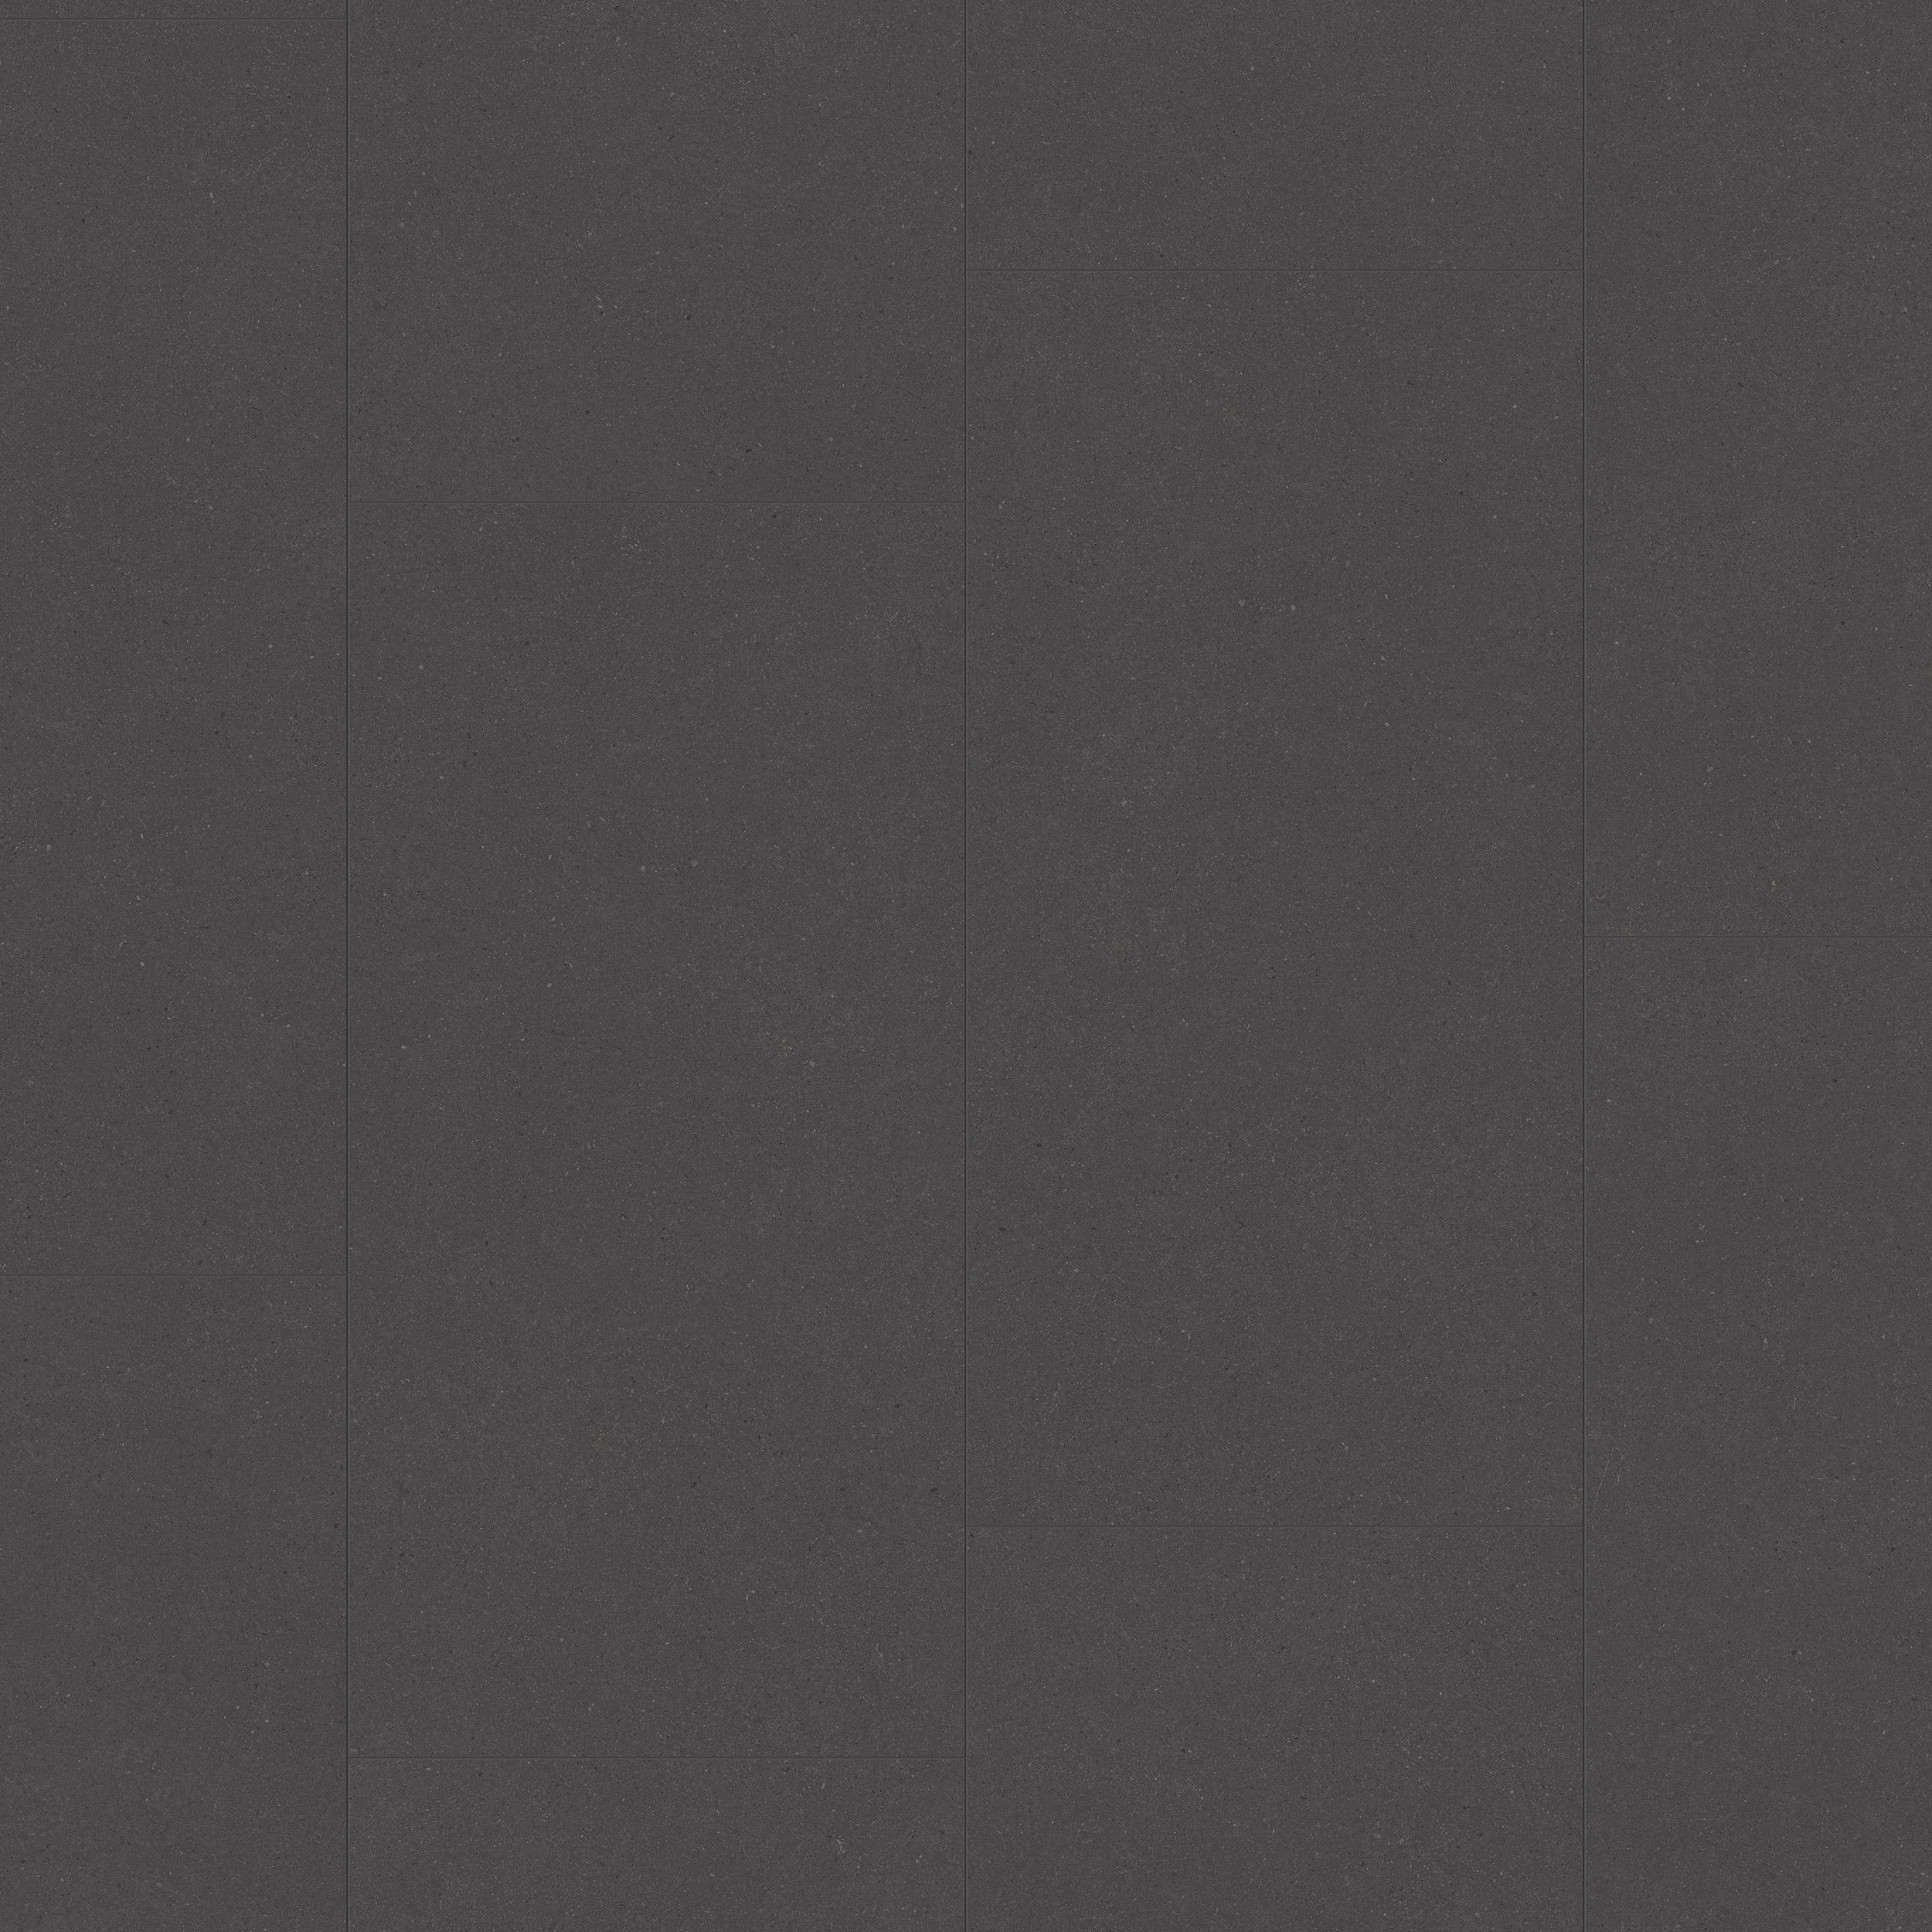 Vinylgolv Pergo Rigid Click Tile Black Modern Mineral